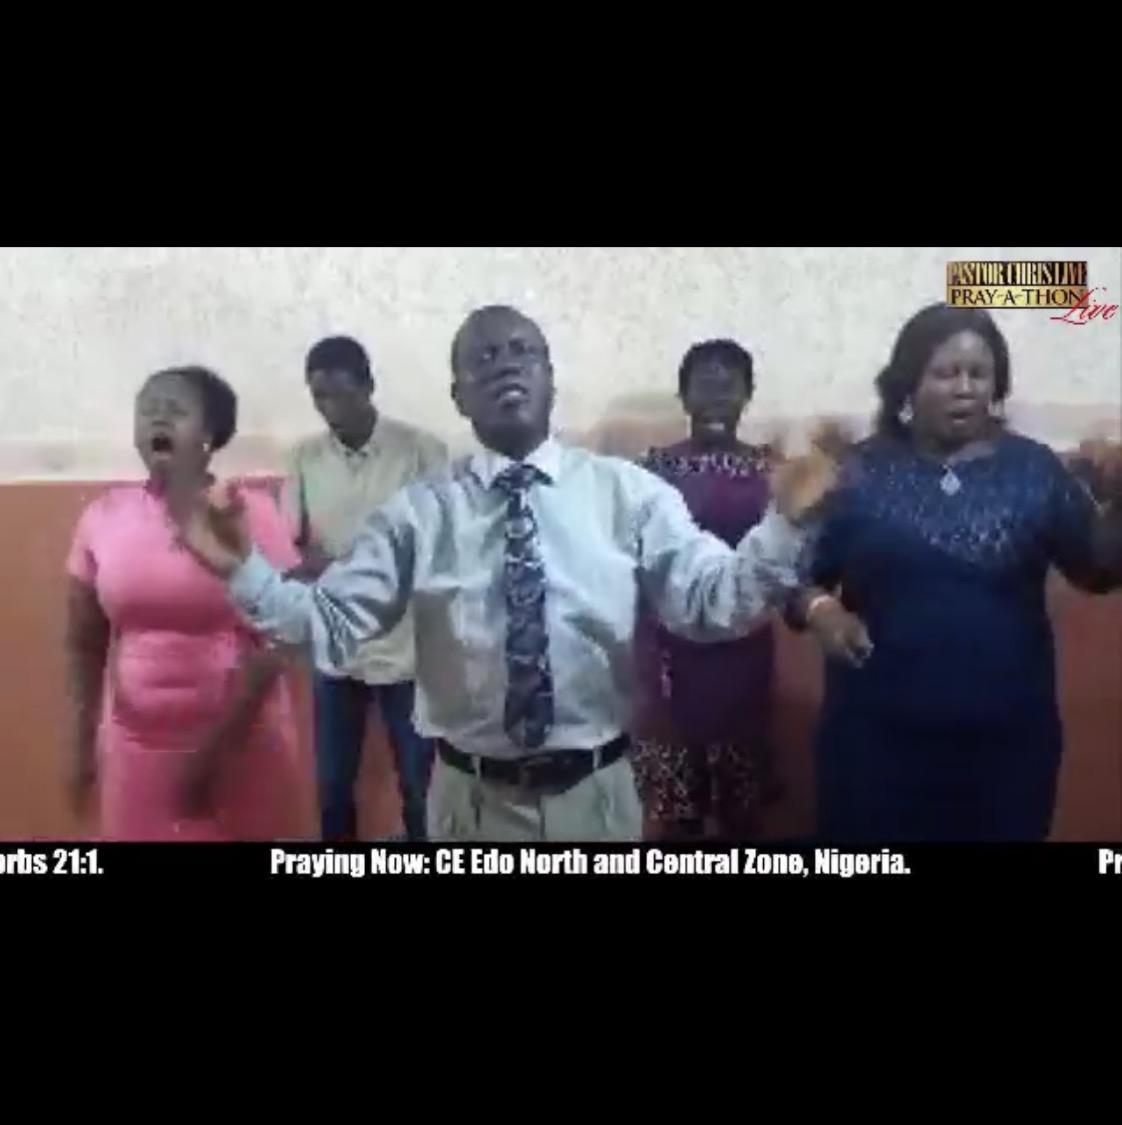 STILL ON PRAYATHON with Pastor